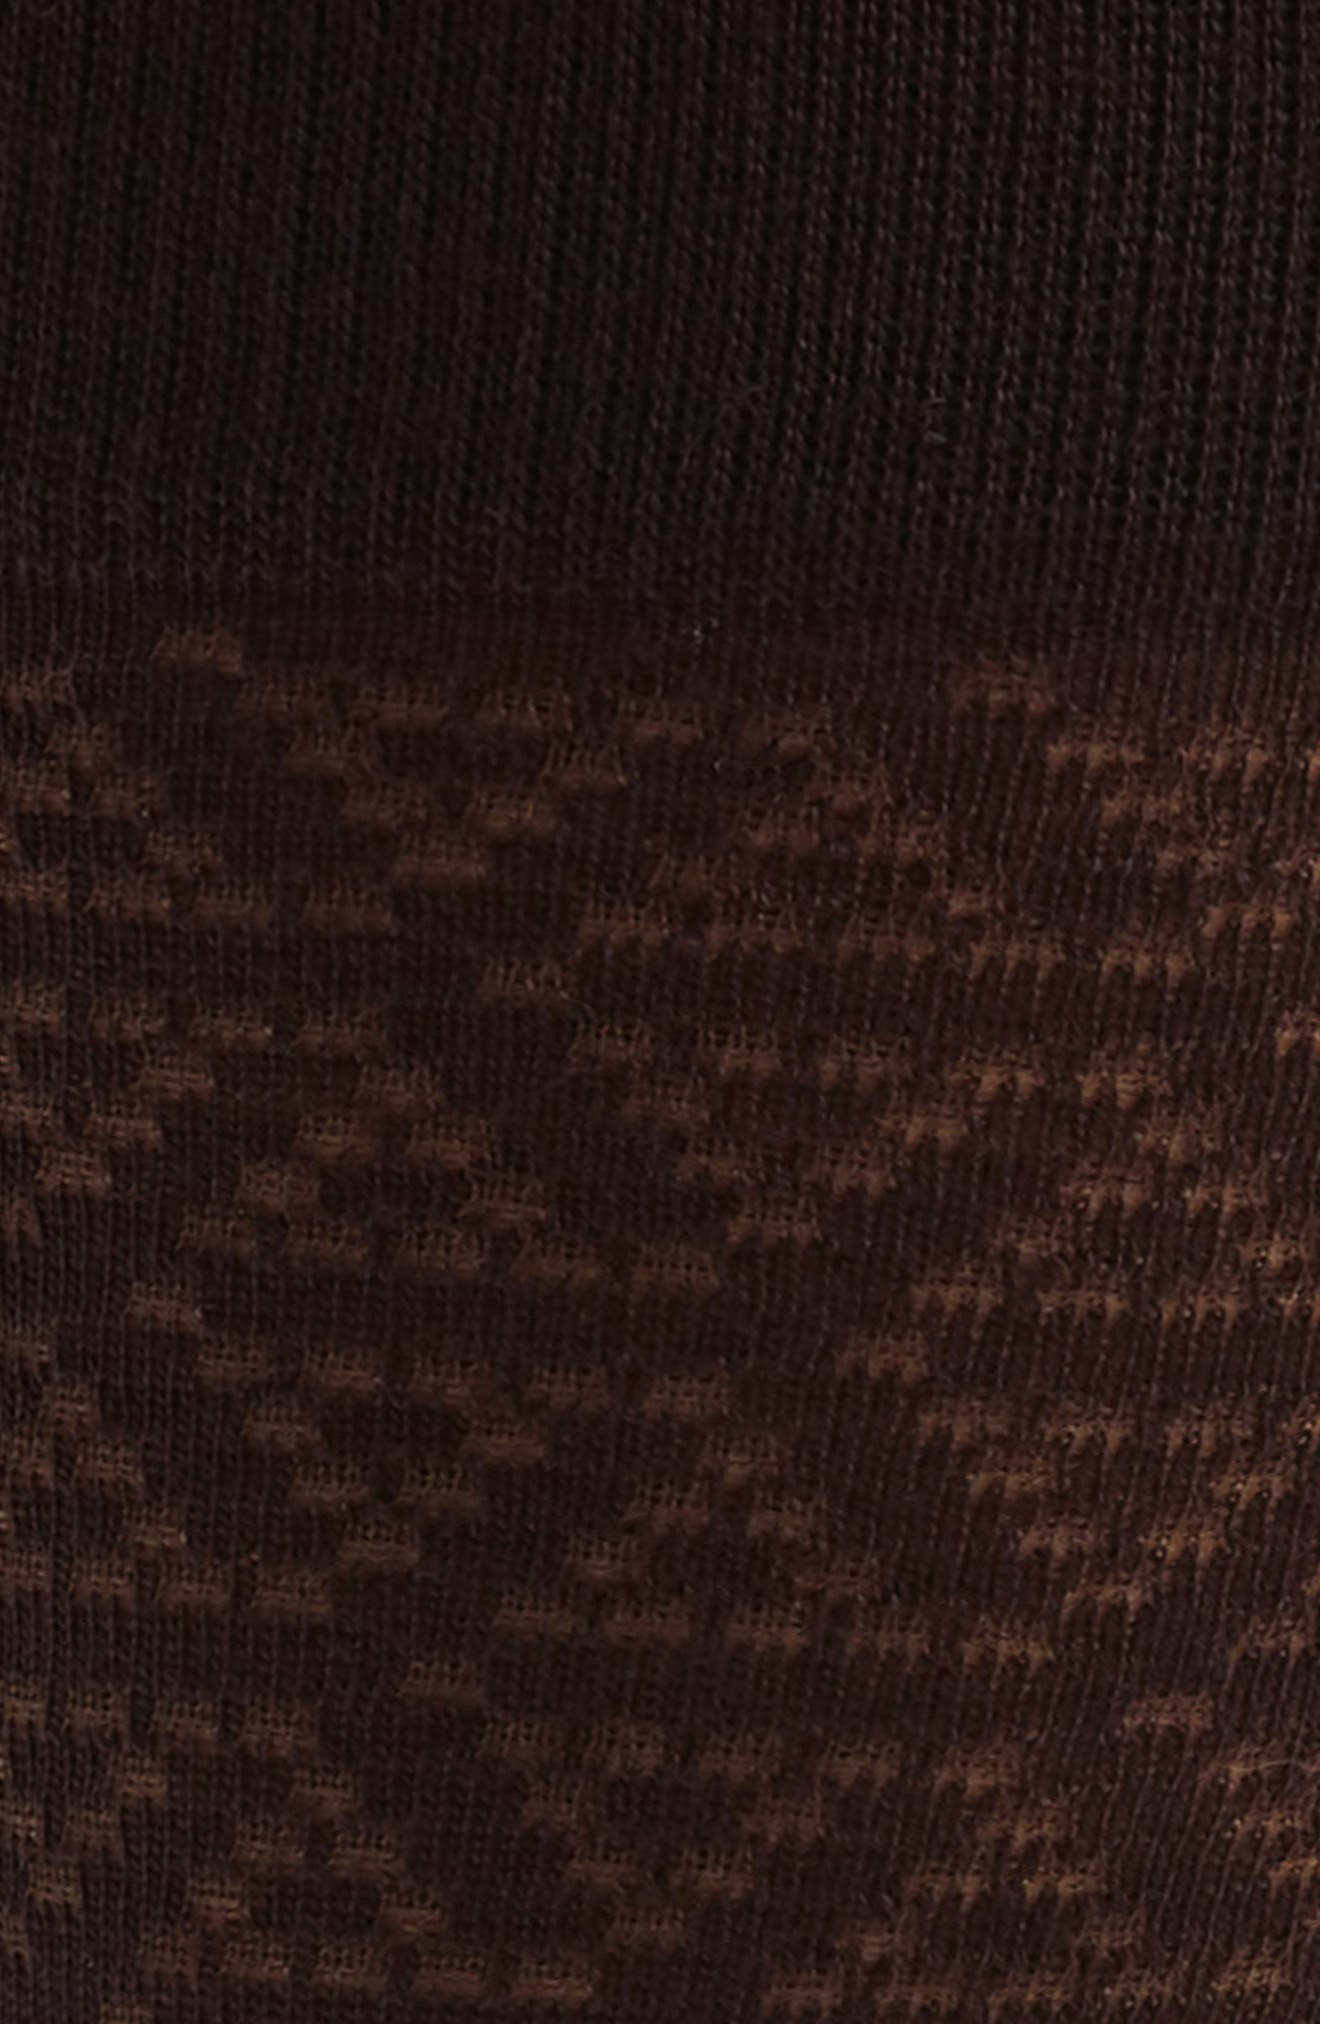 Pointed Triangle Socks,                             Alternate thumbnail 2, color,                             BURGUNDY STEM